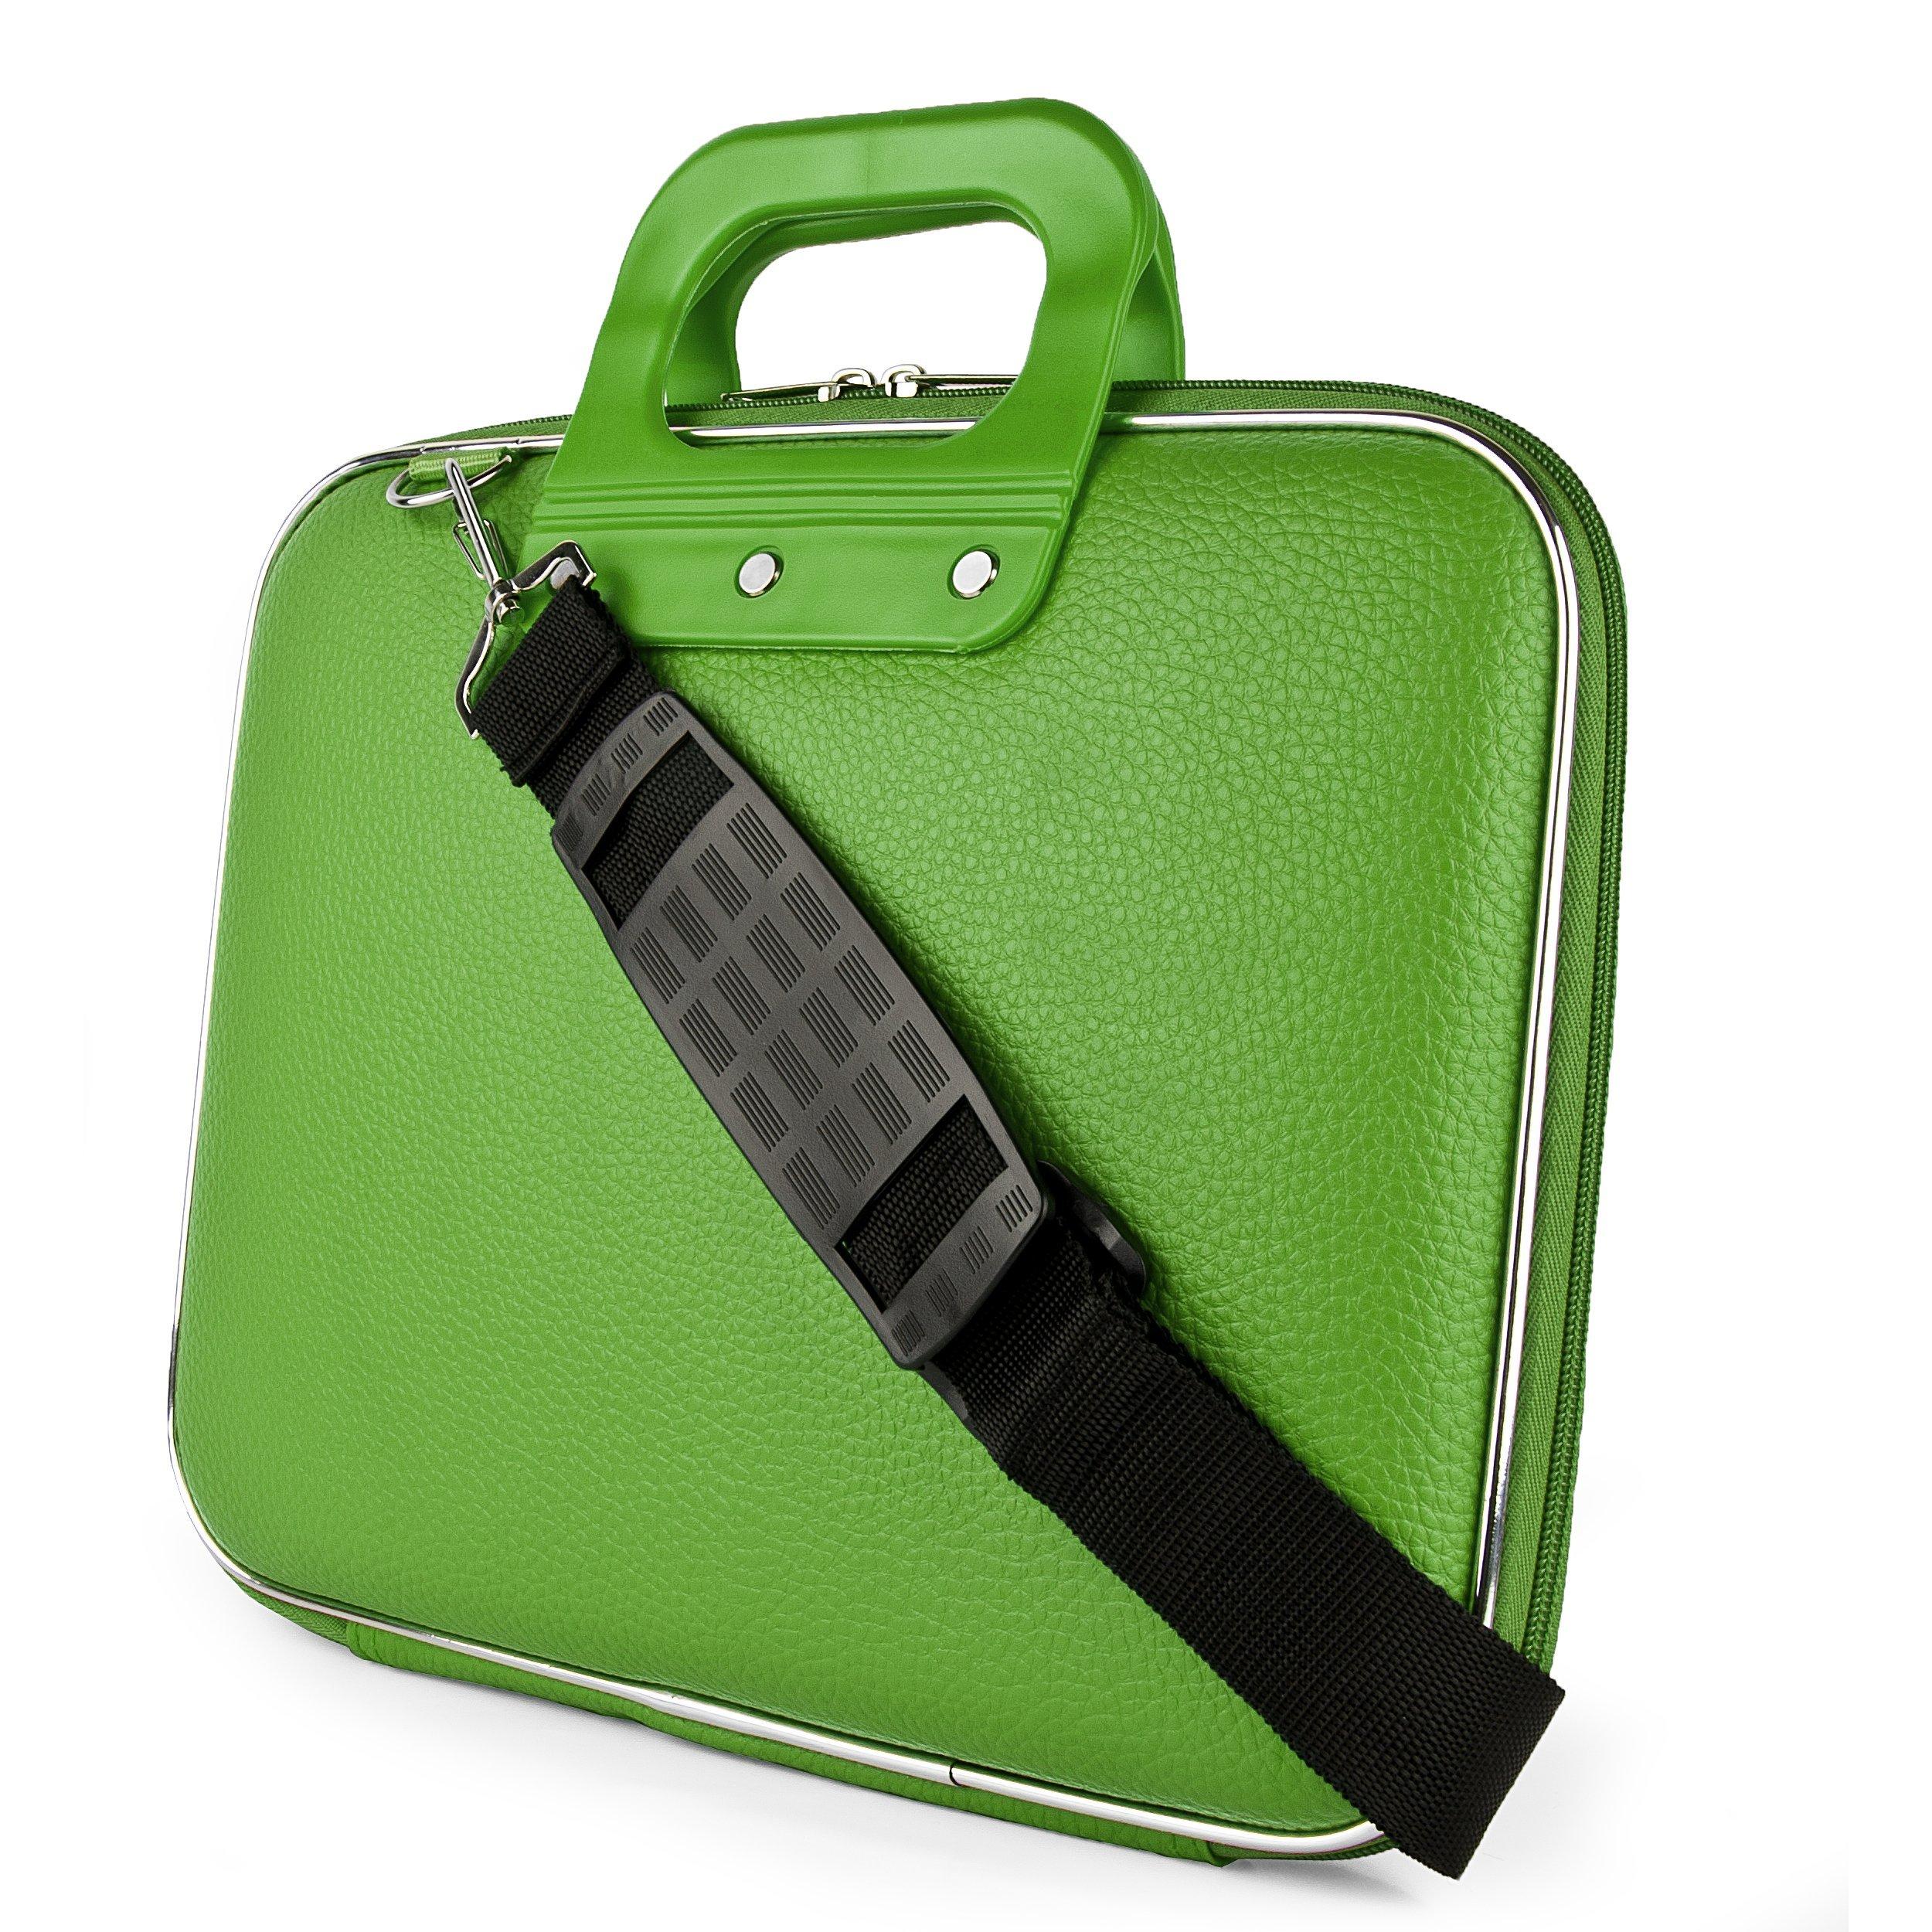 SumacLife Cady Shoulder Messenger Bag Case Sleeve for Lenovo Thinkpad E550/E555/Flex 3/Z50/Z51 15.6/15.6-inch Laptops (Green) by SumacLife